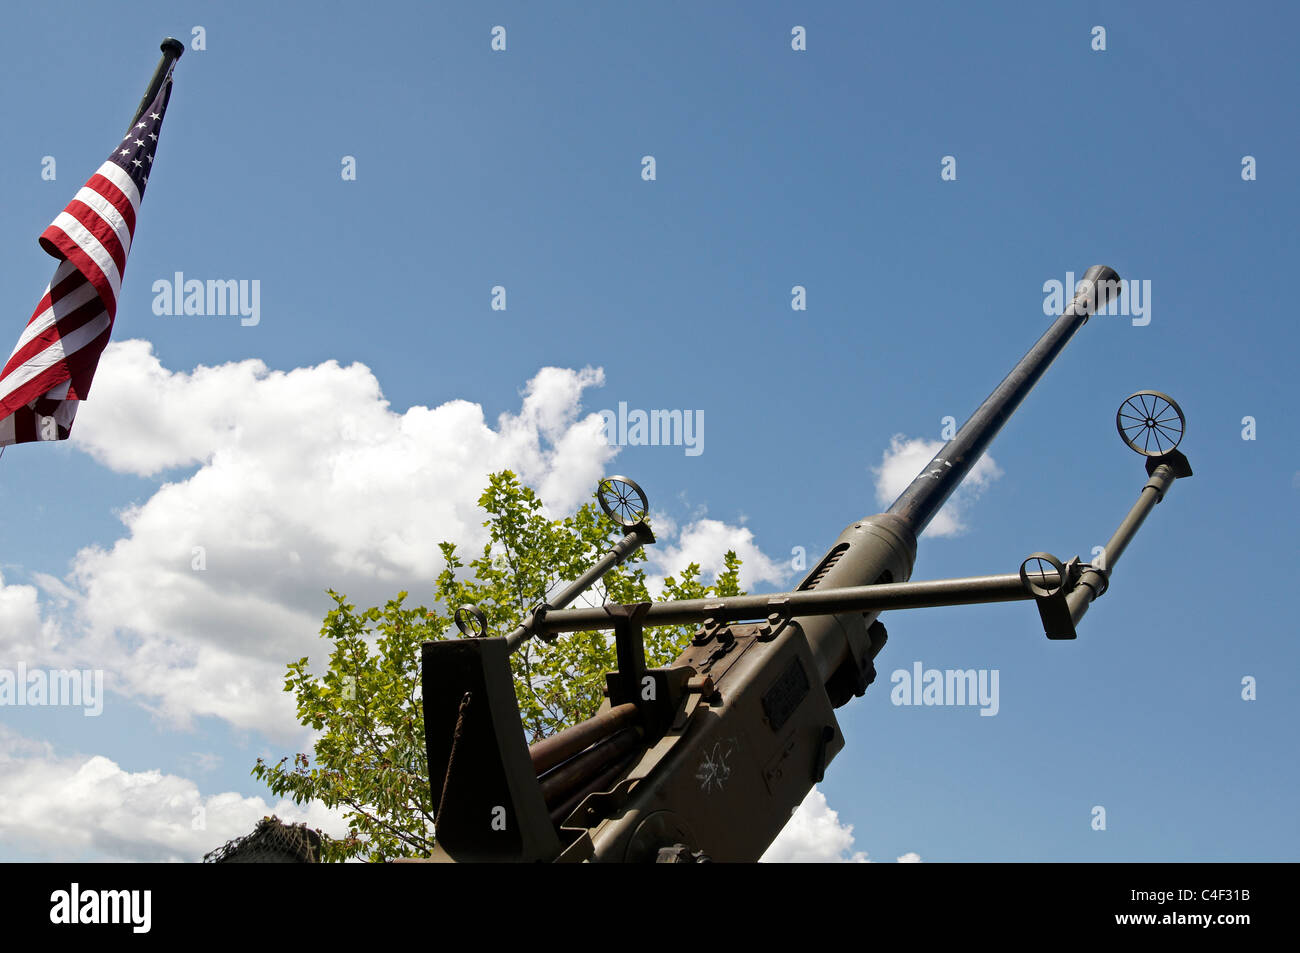 World War Two anti-aircraft gun or ack-ack gun on display at a WW2 re-enactment. - Stock Image